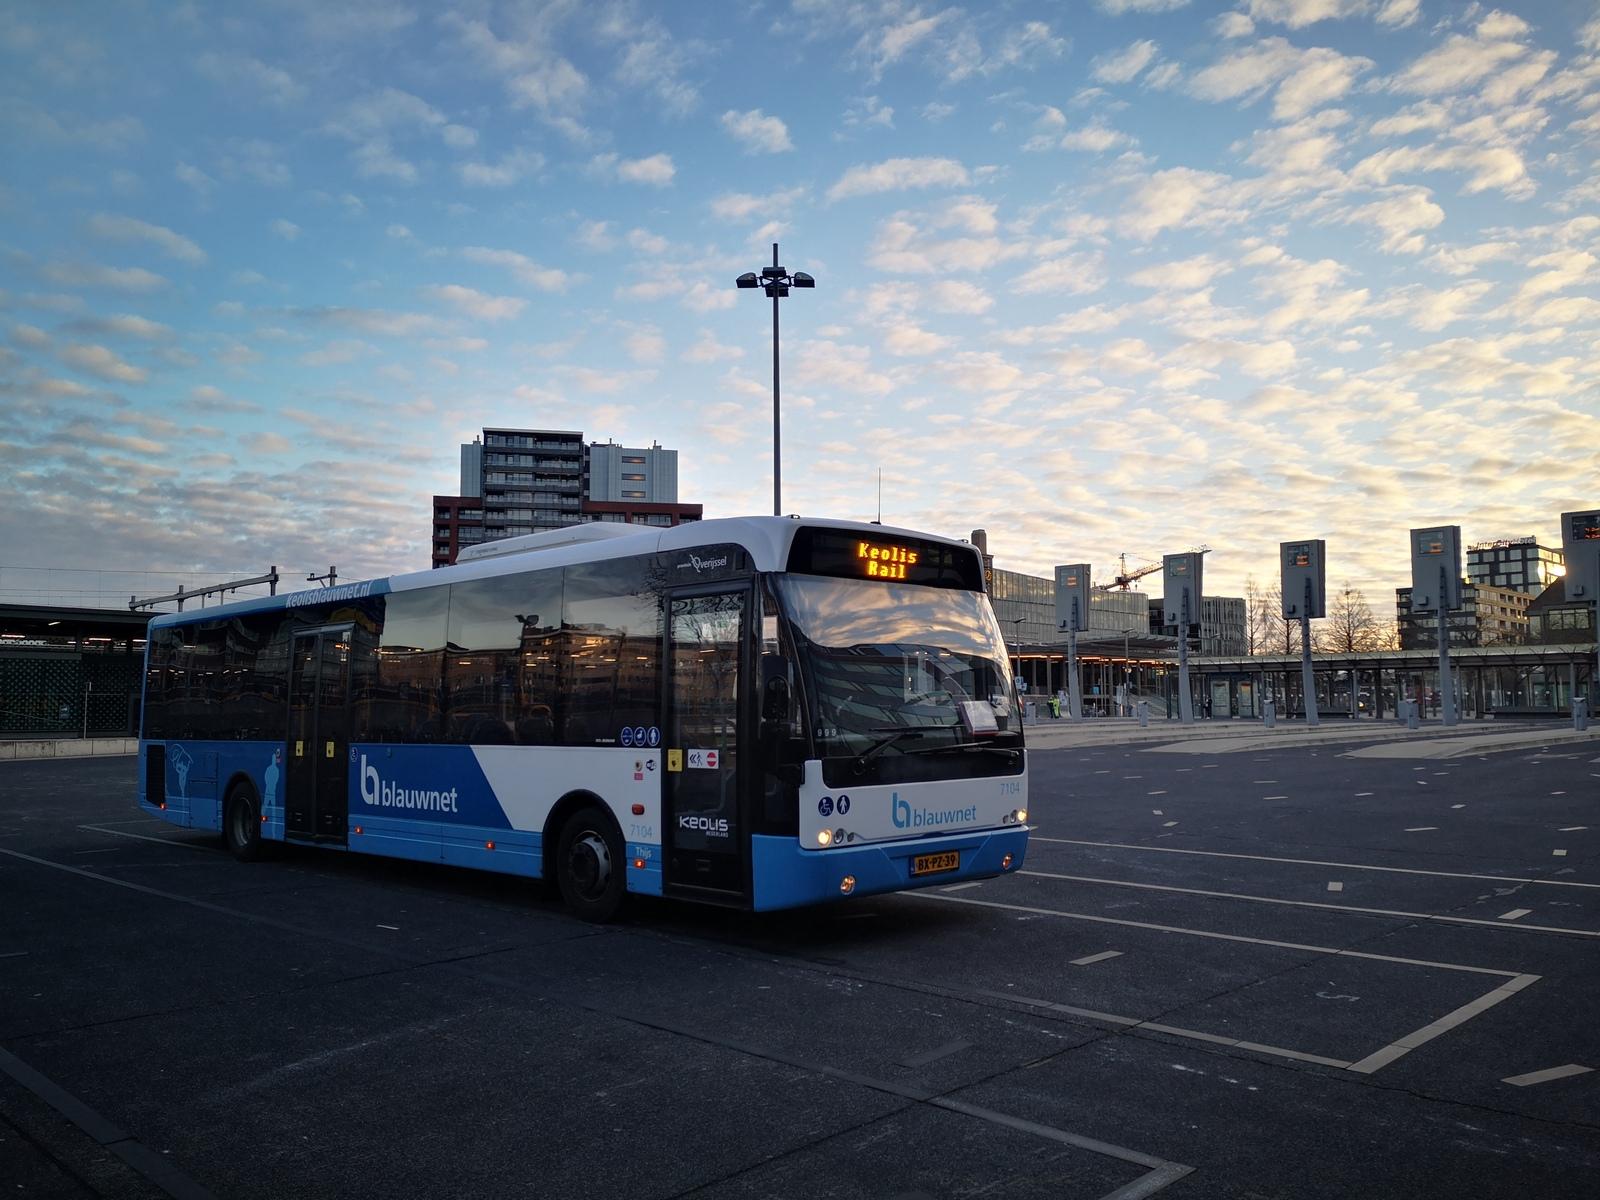 Geen trein maar bus op traject Zwolle-Kampen tussen woensdag 28 april t/m maandag 3 mei